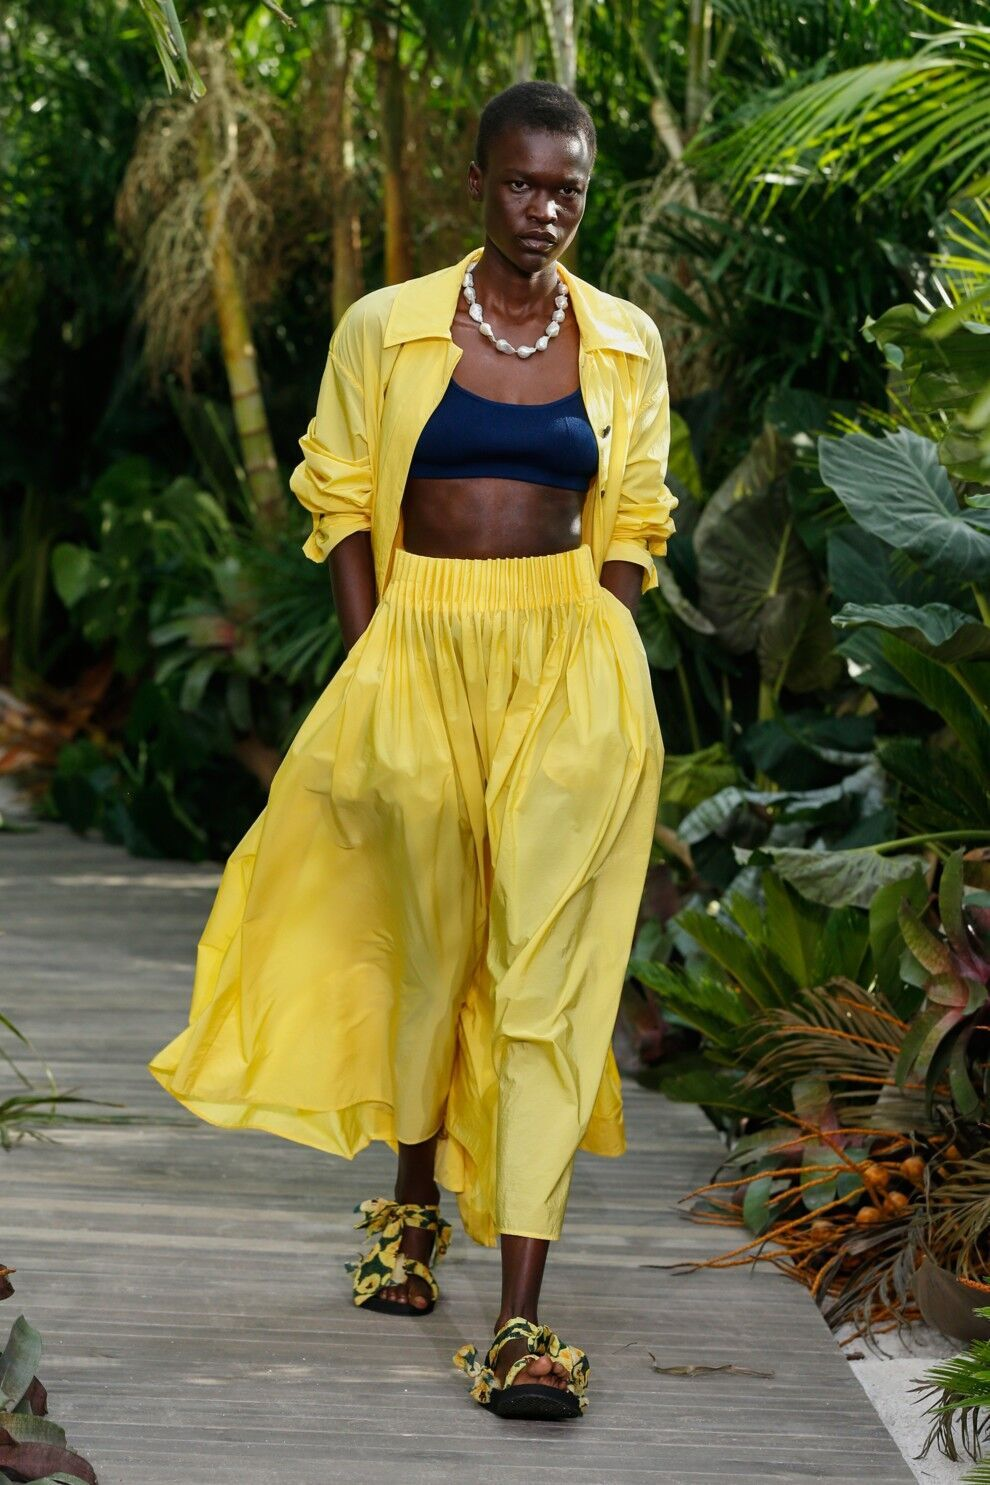 Модный желтый костюм от Jason Wu